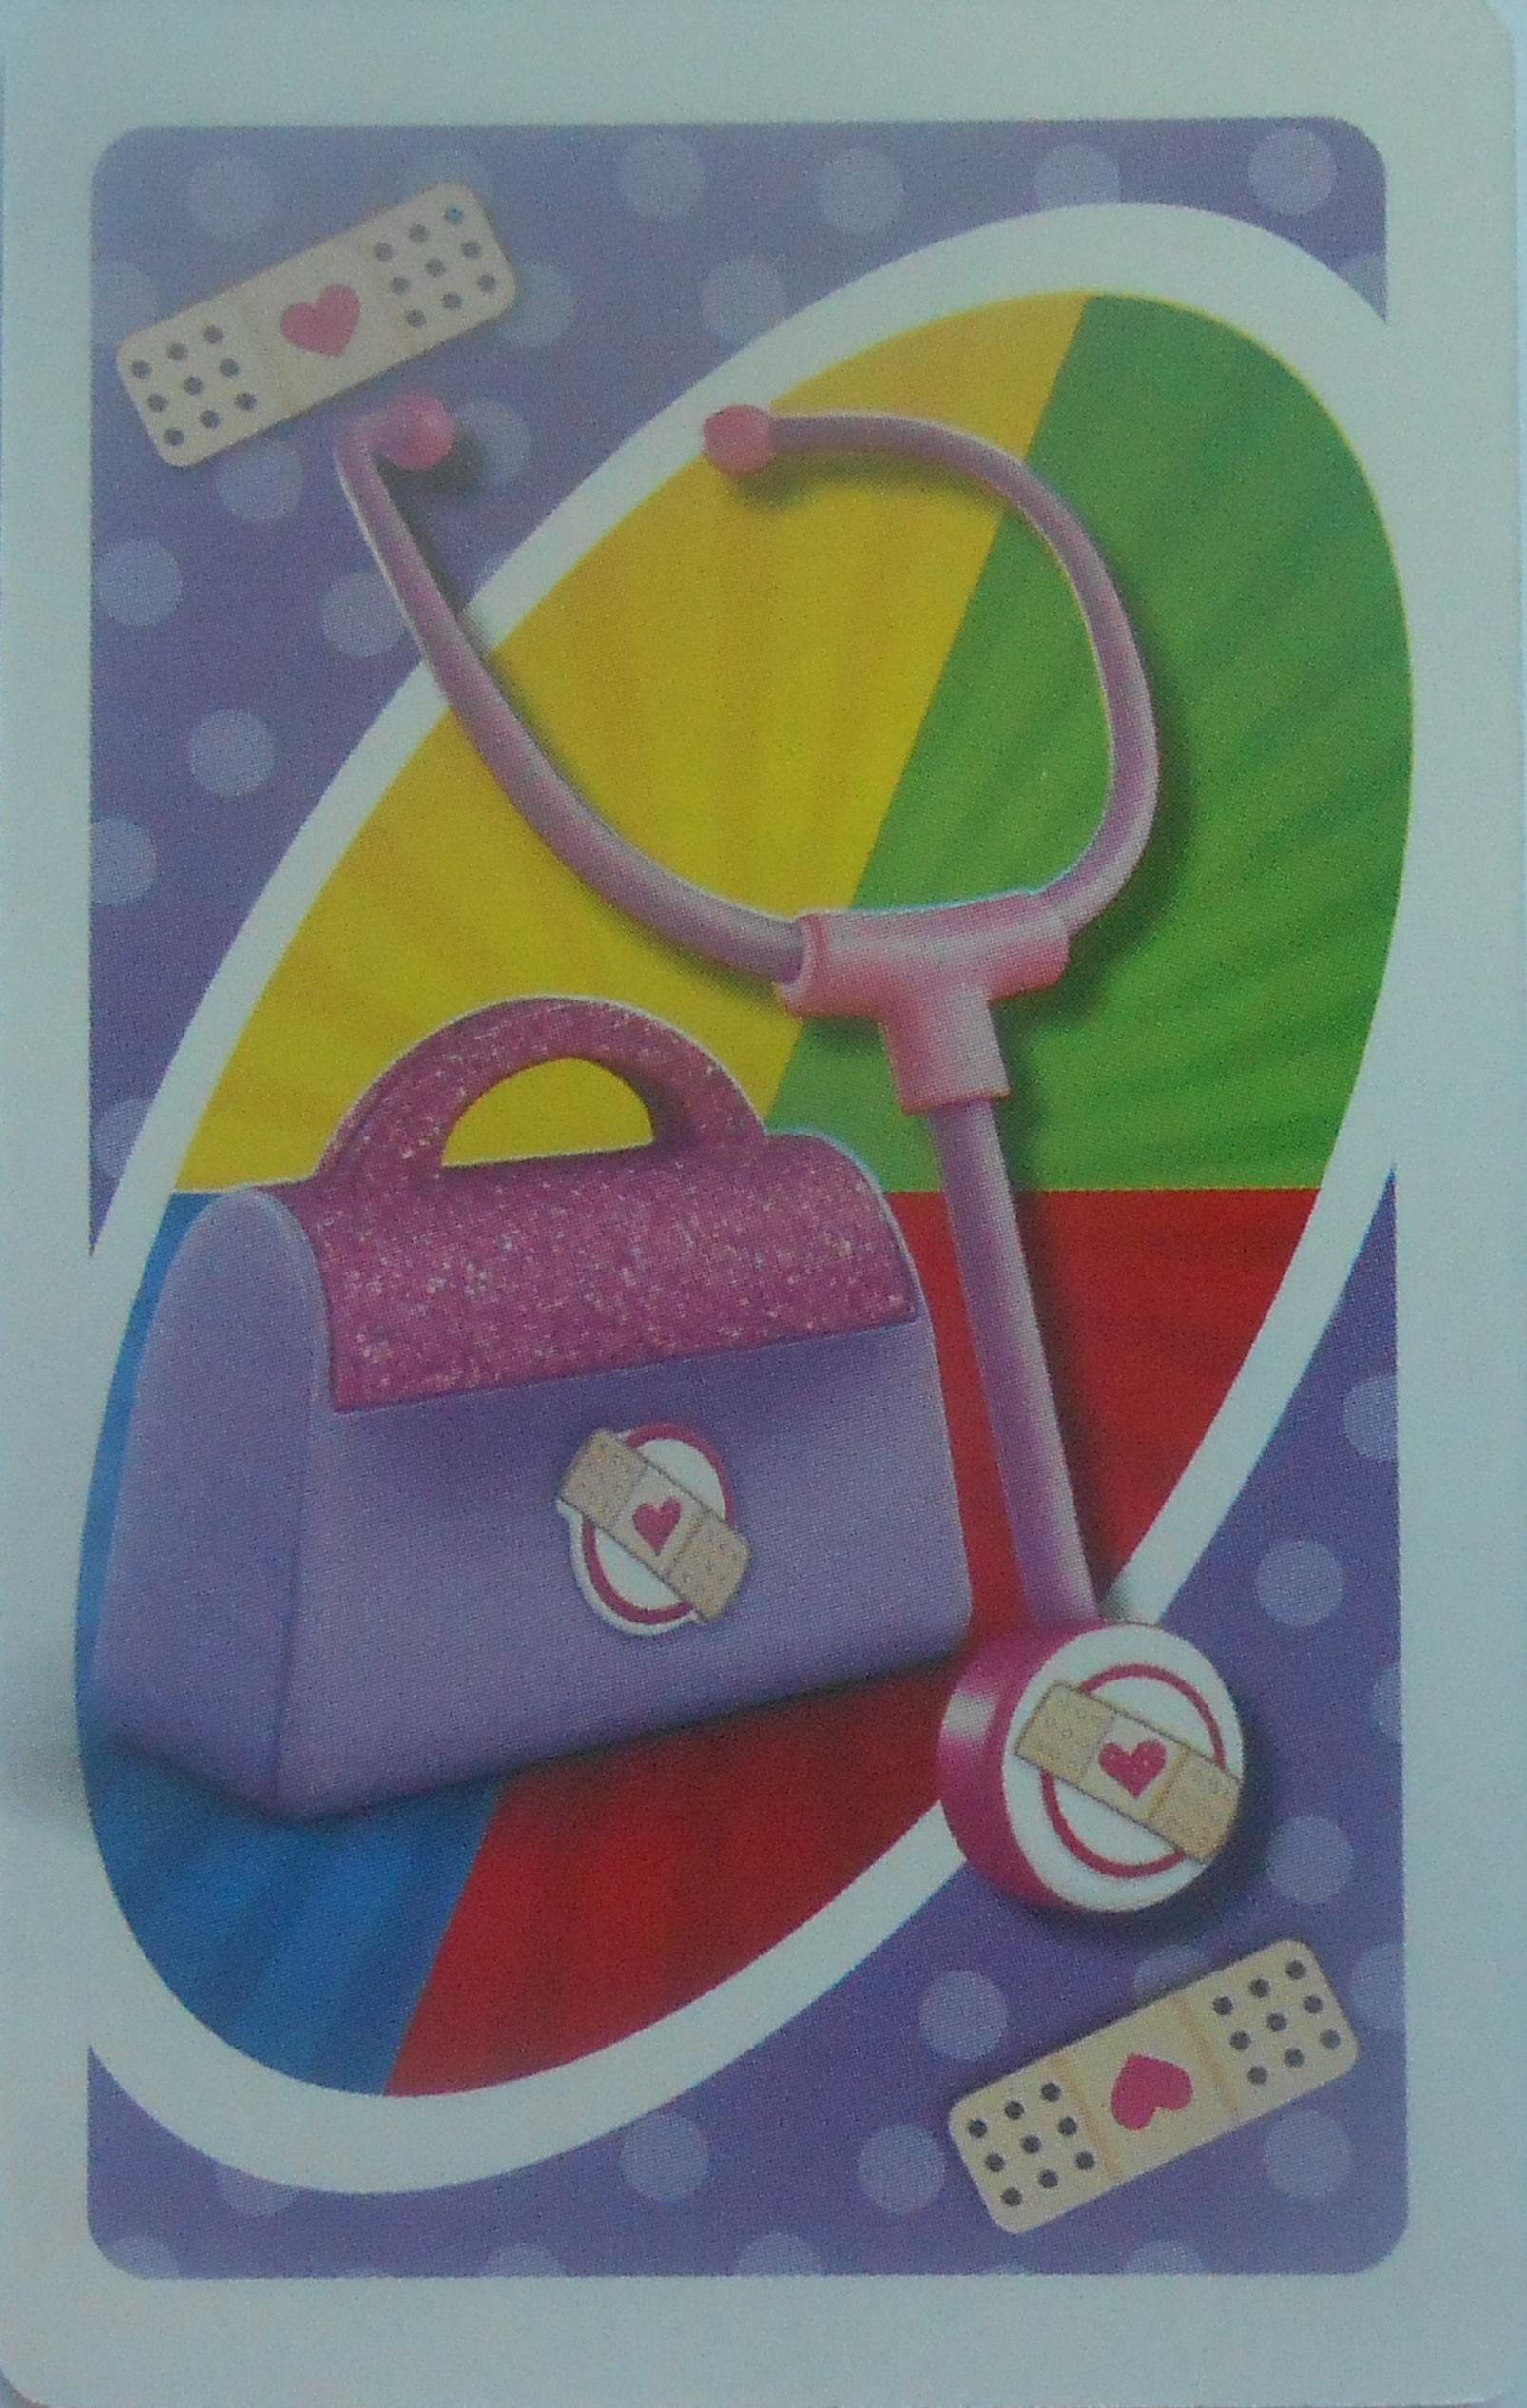 Doc McStuffins Uno (Stethoscope Card)